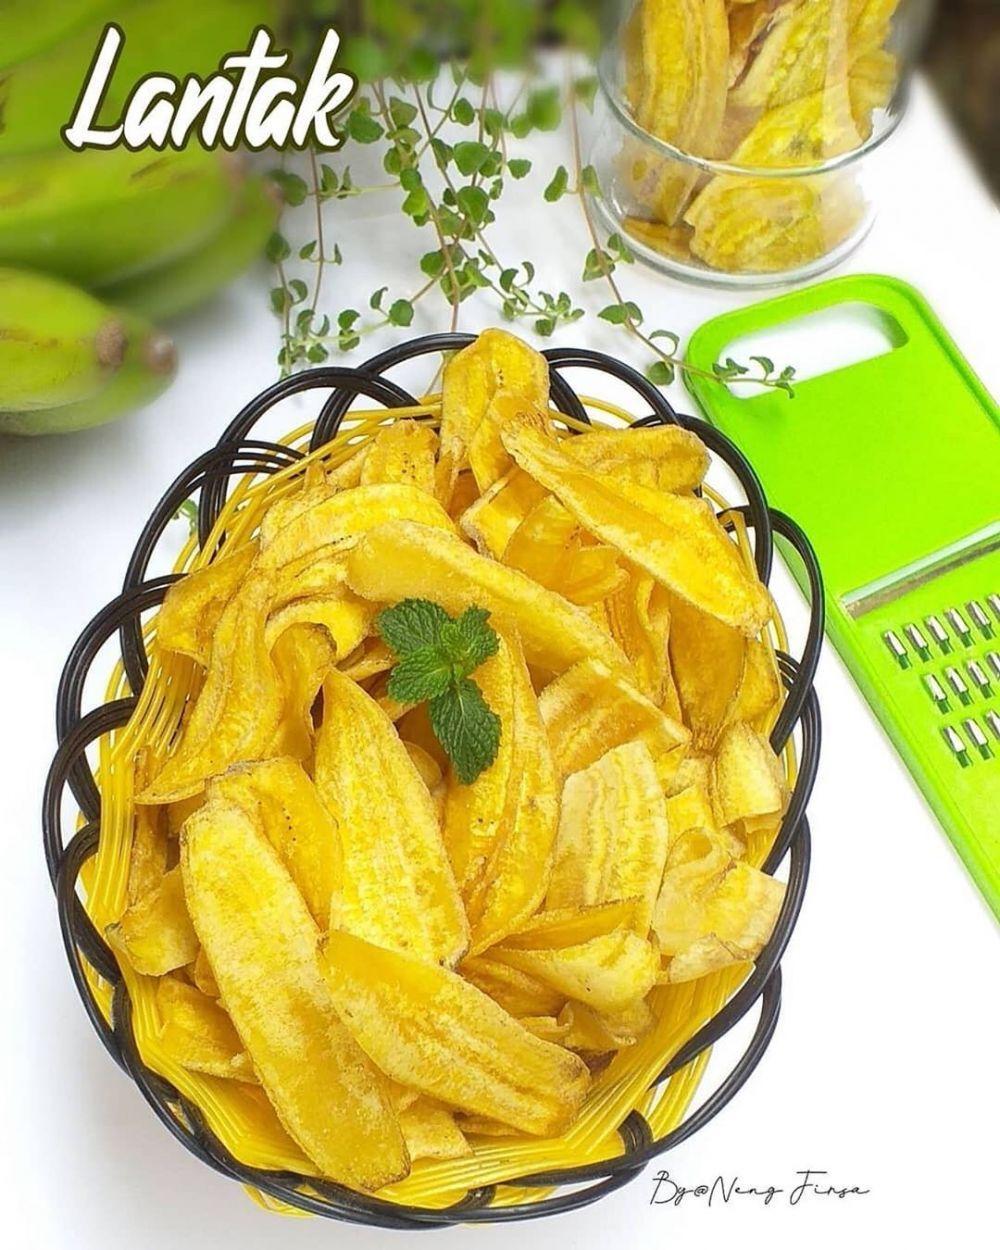 10 Cara Membuat Keripik Pisang Enak Renyah Dan Sederhana Instagram Makanan Dan Minuman Keripik Pisang